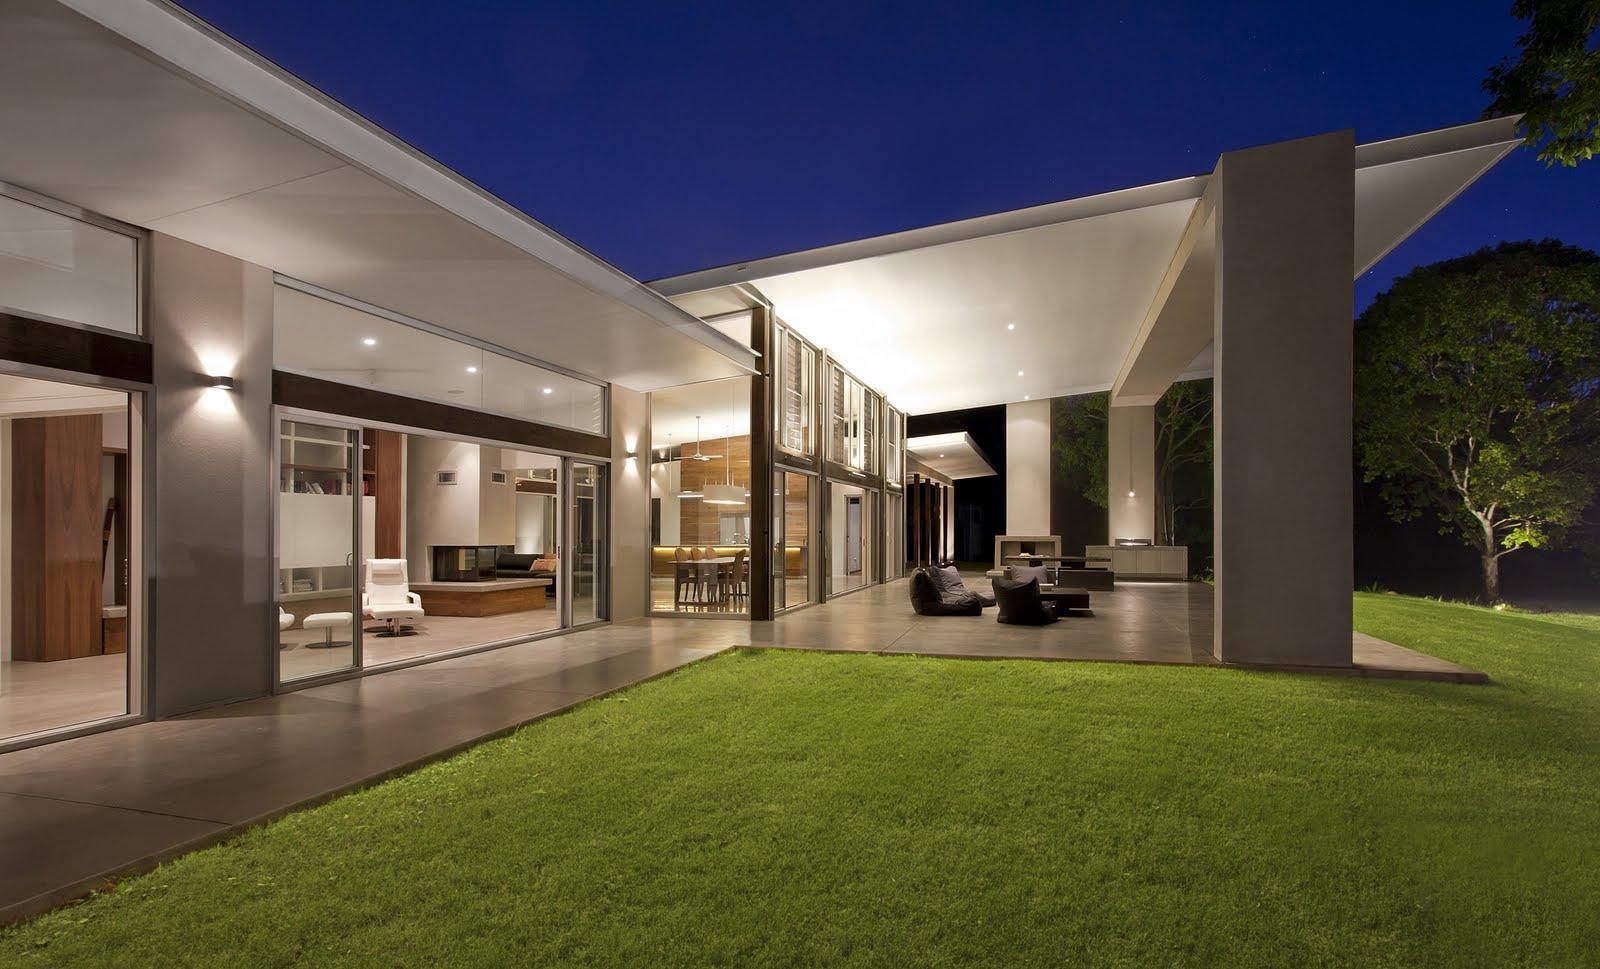 Building designers association queensland 2011 queensland for New home designs qld